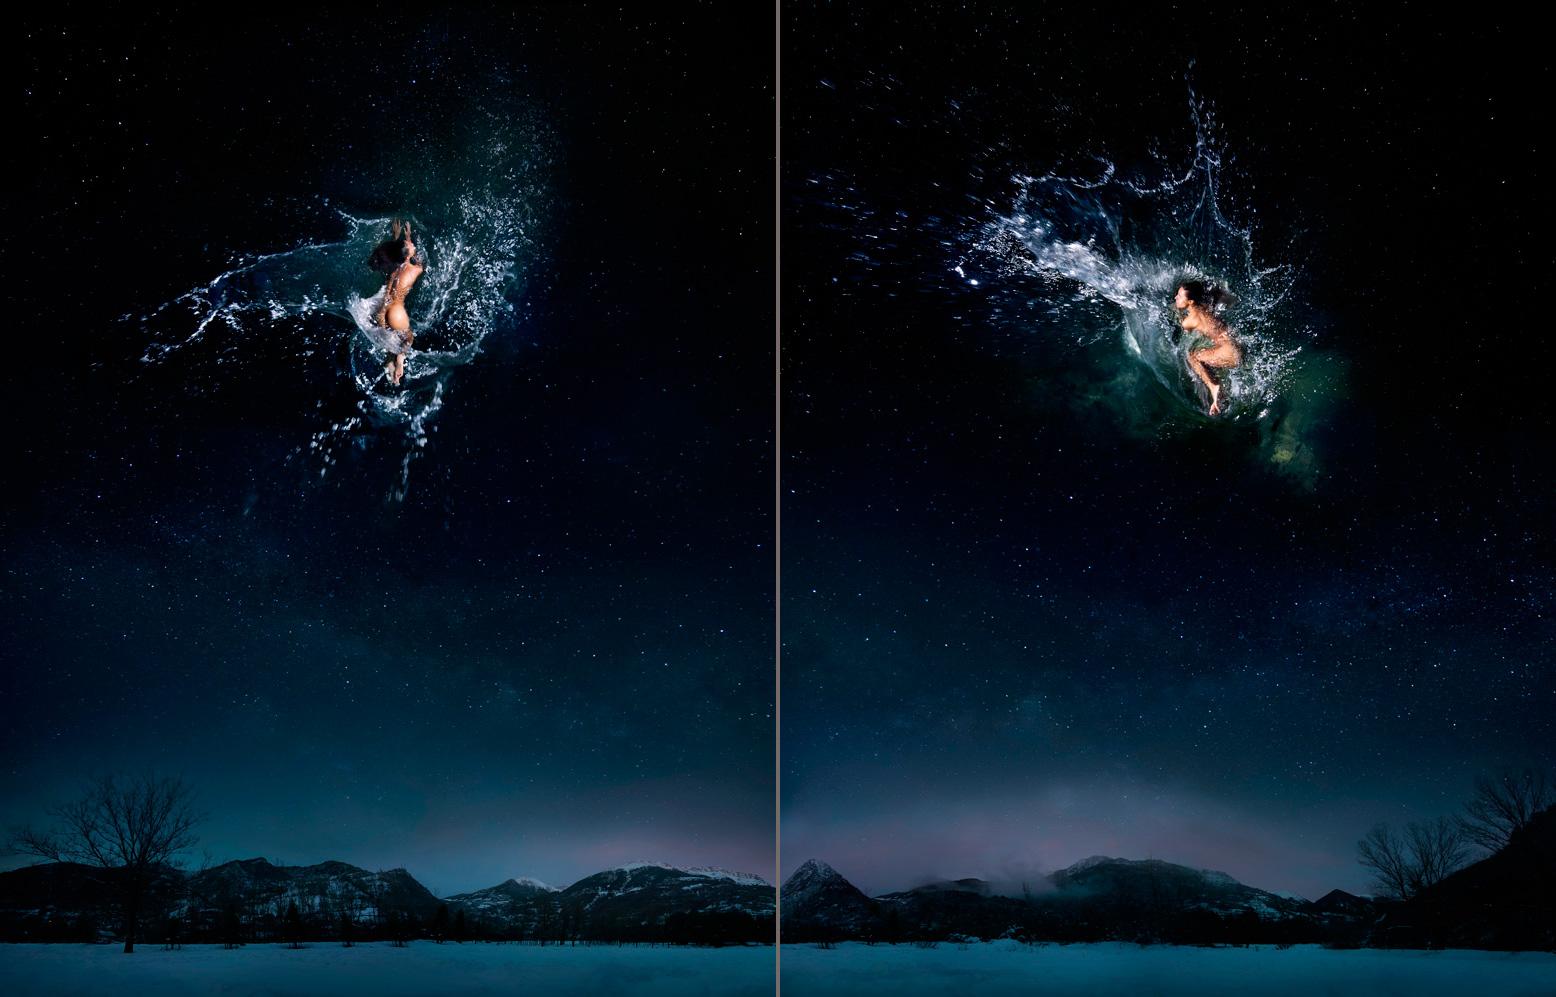 Estrella (β) aquarii - Sadalsuud / Estrella (γ) aquarii  - Sadachbia